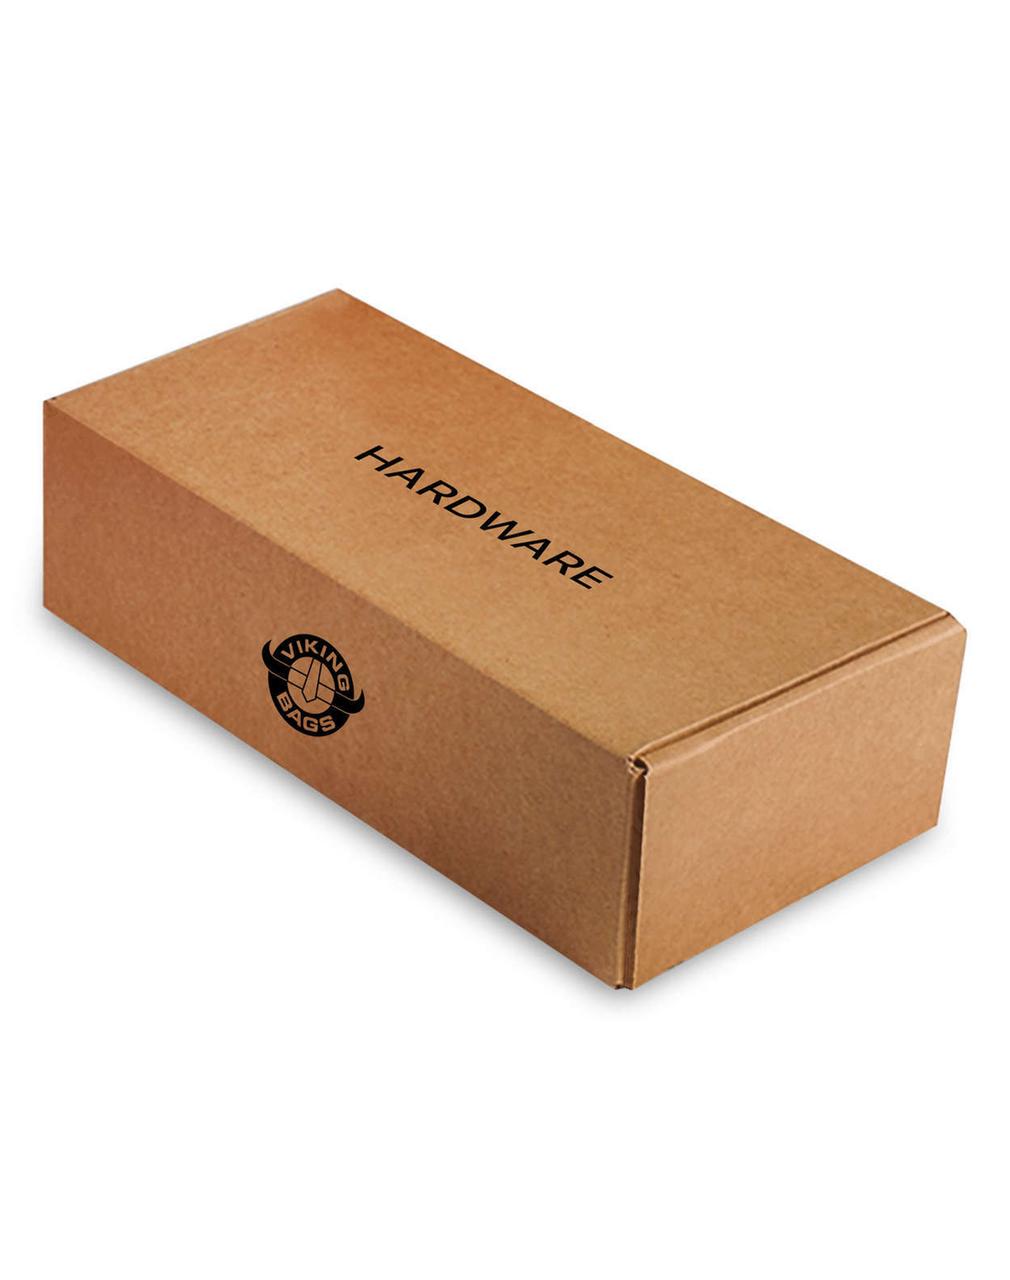 Honda 1100 Shadow Aero Viking Lamellar Leather Covered Shock Cutout Hard Saddlebag Box